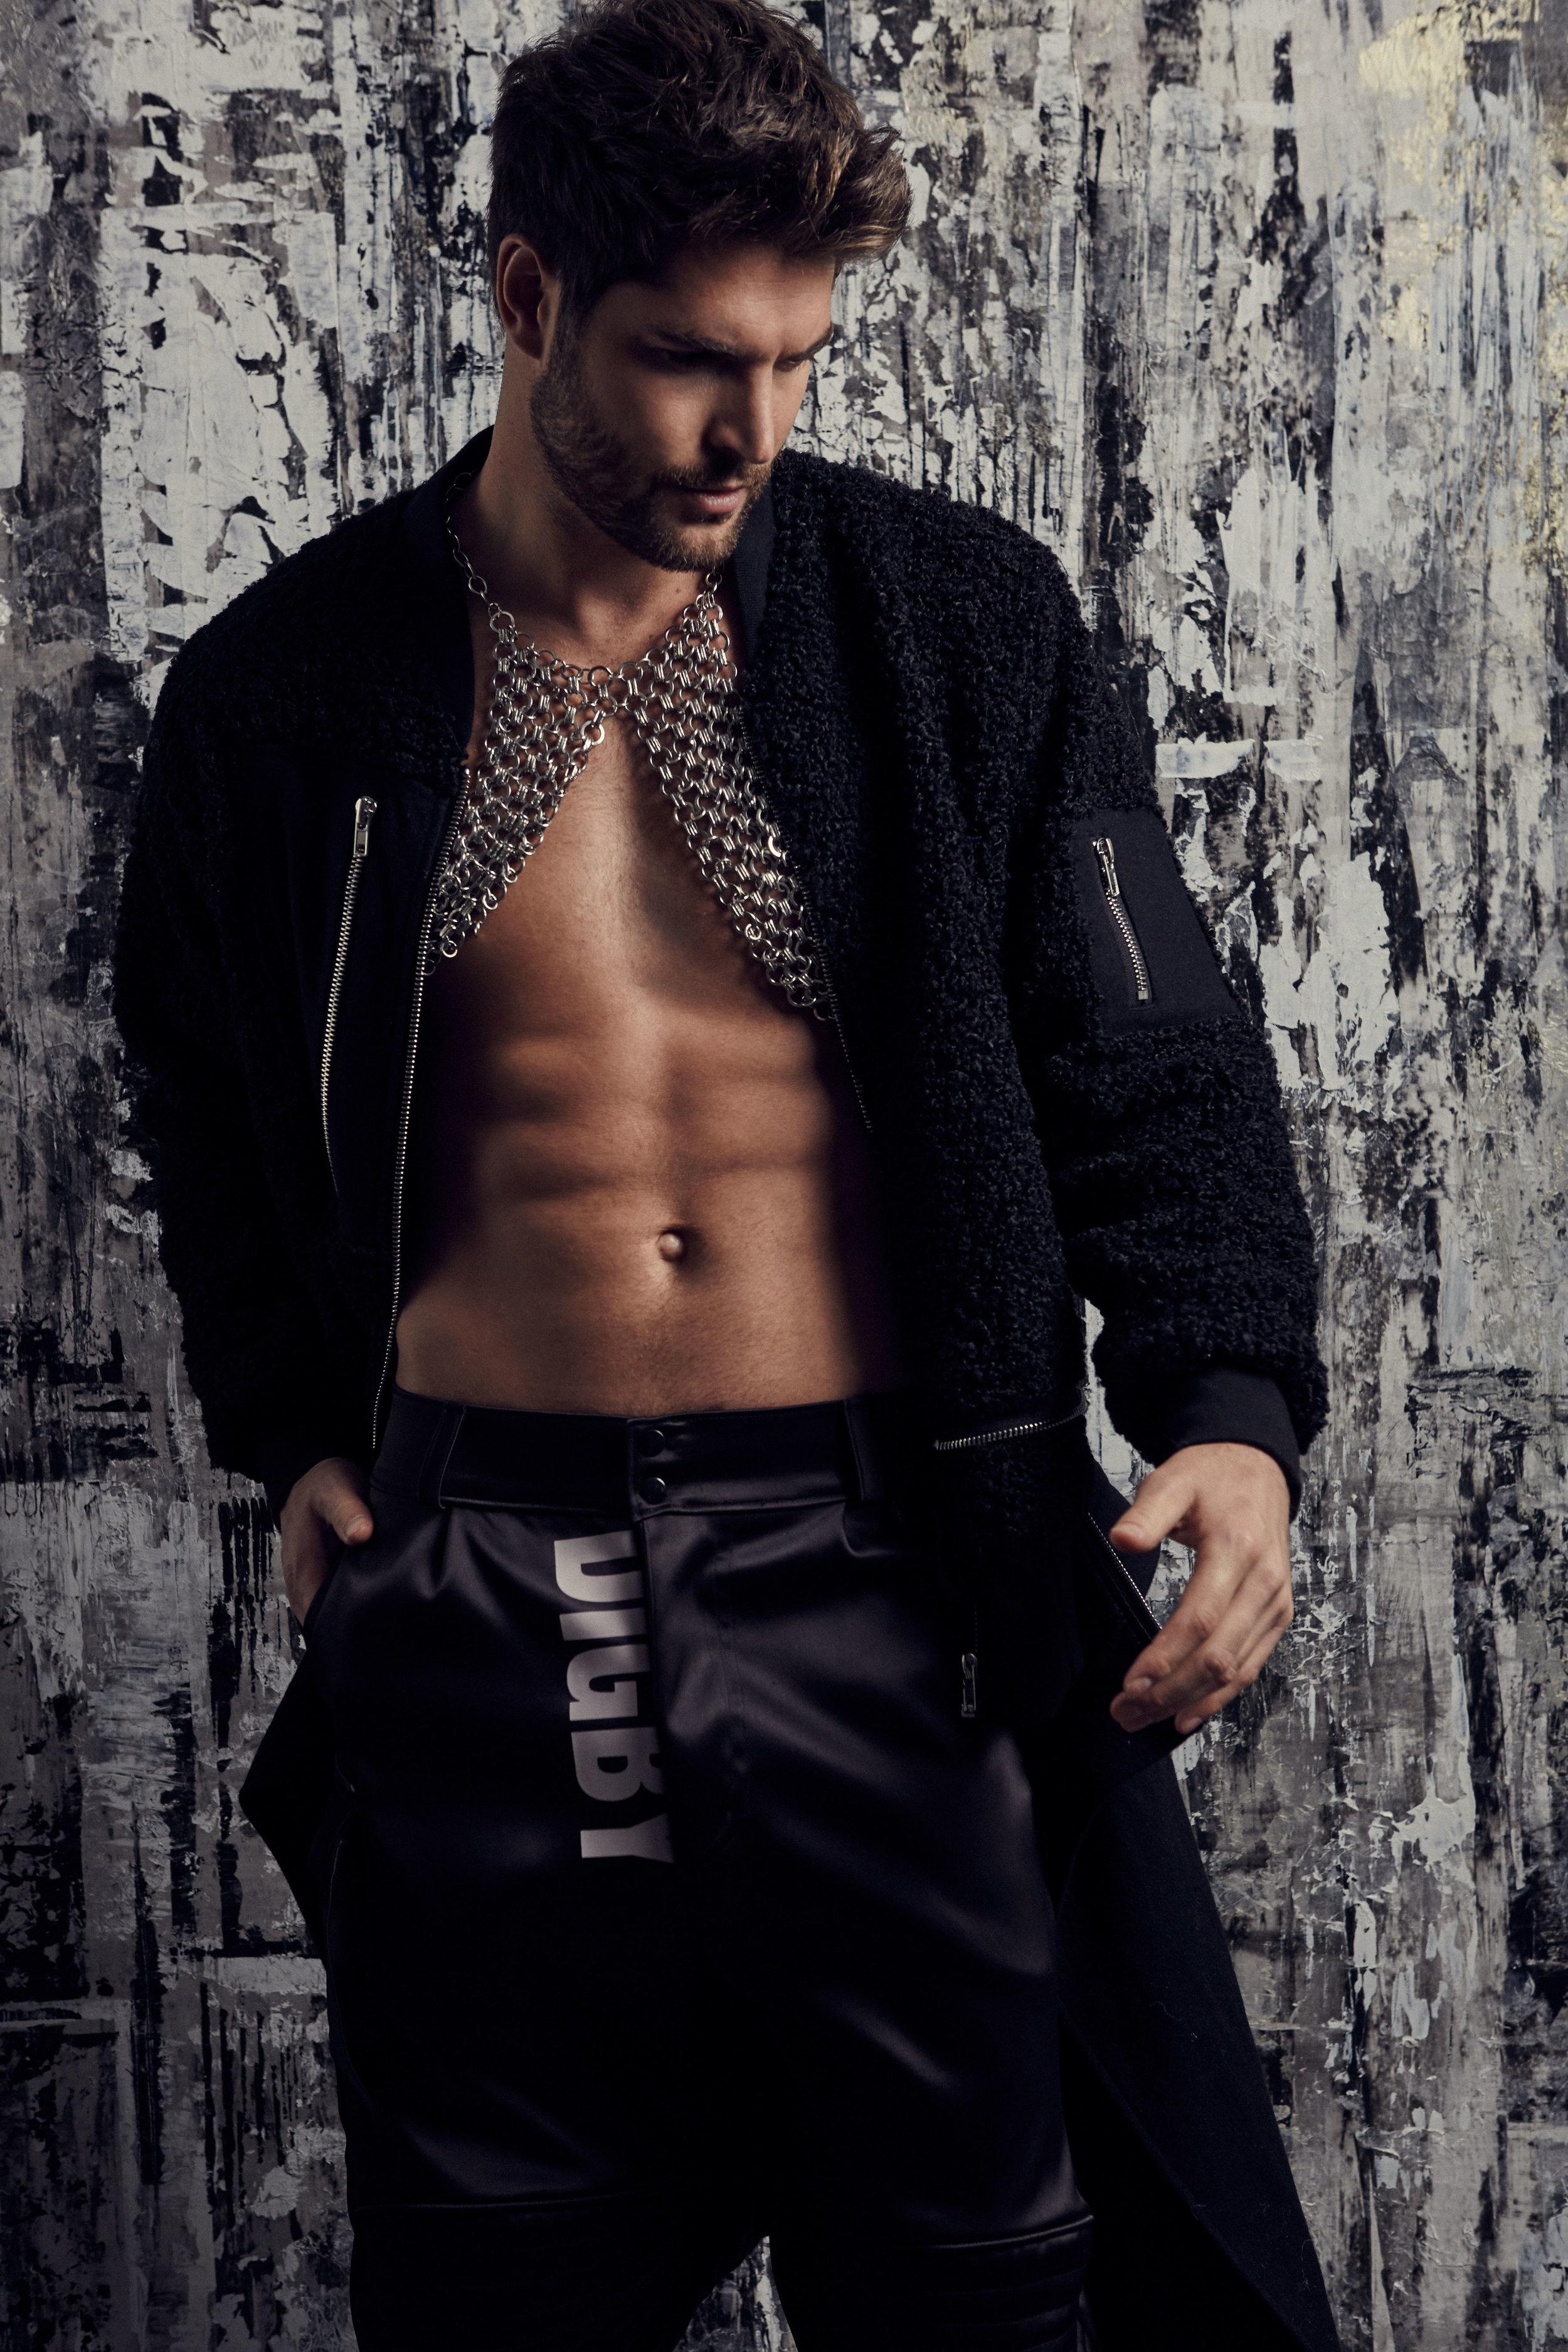 Coat by Lijin / Pants by Digby Jackson